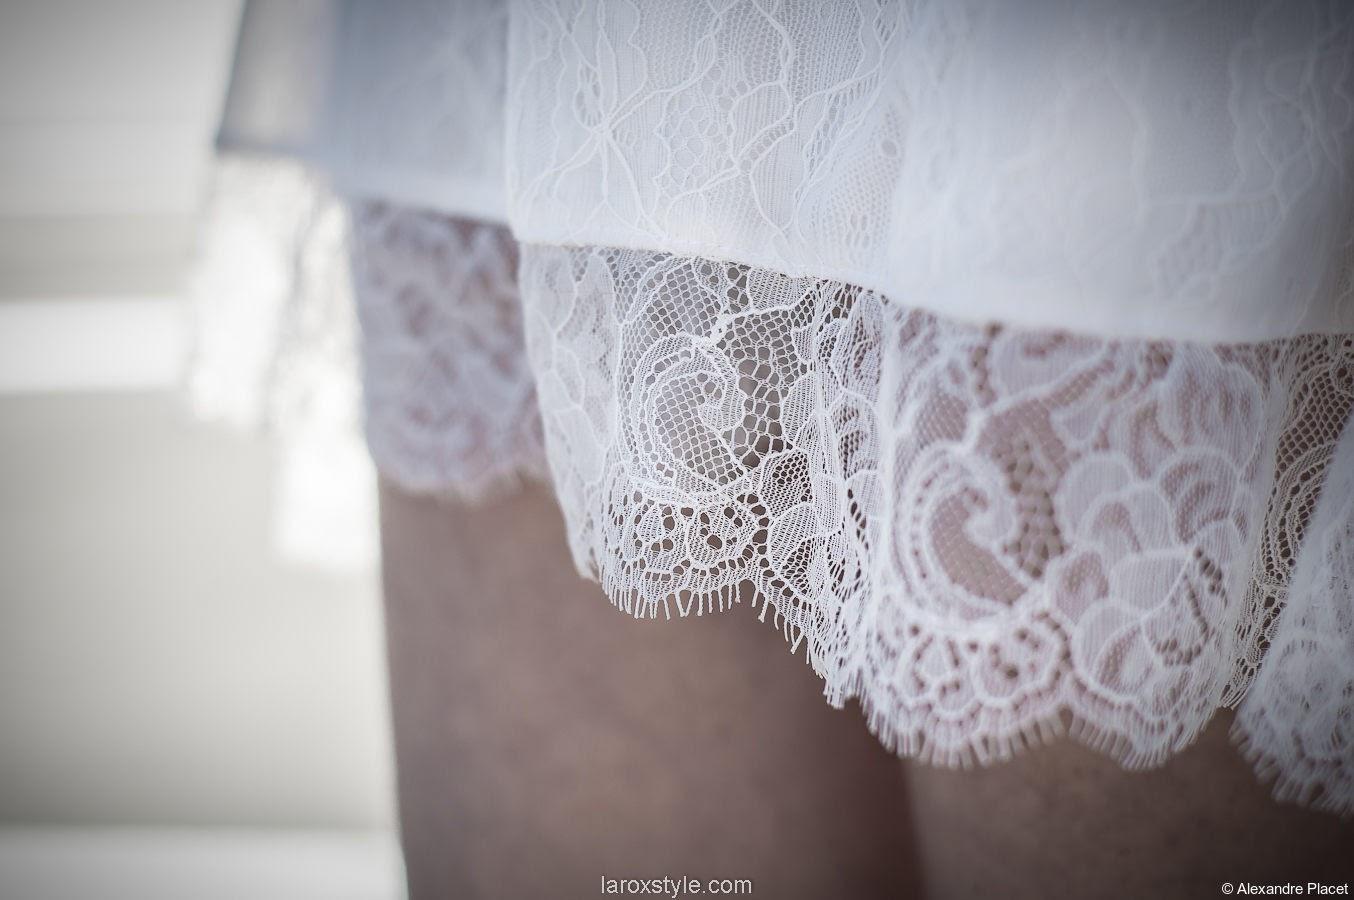 Laroxstyle - blog mode lyon - look robe mariage - caroline quesnel - IMGP6947